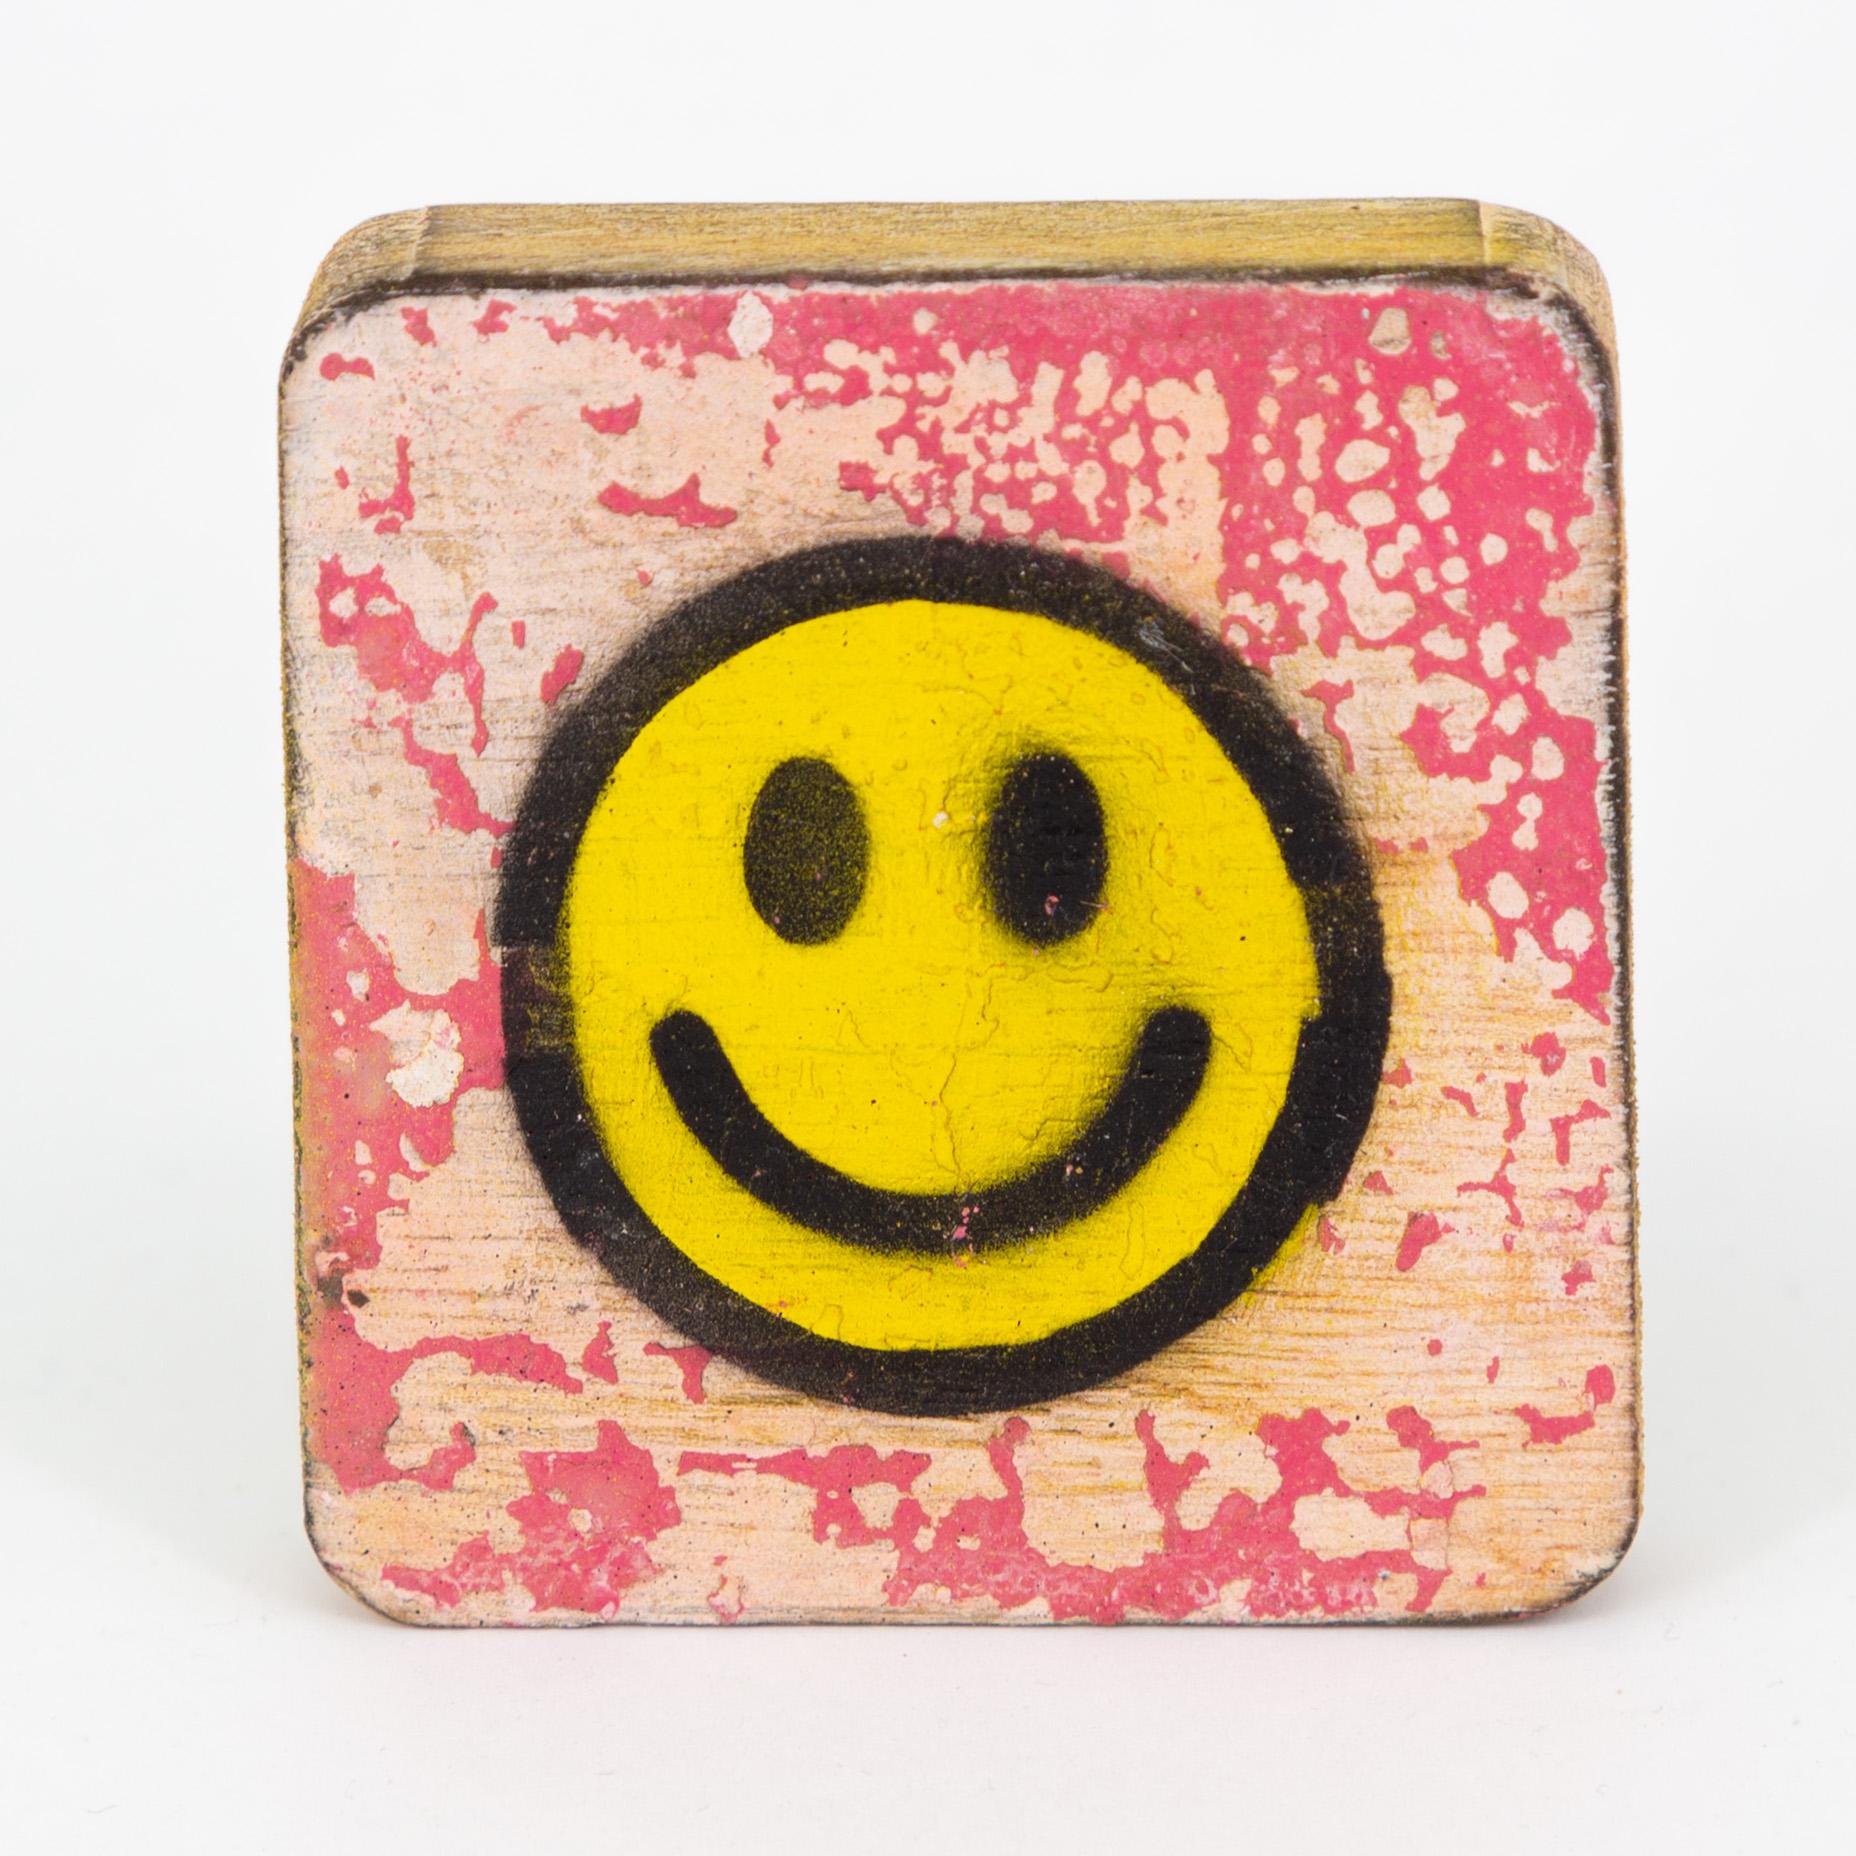 Holzsymbol - Smiley - im Scrabble-Style